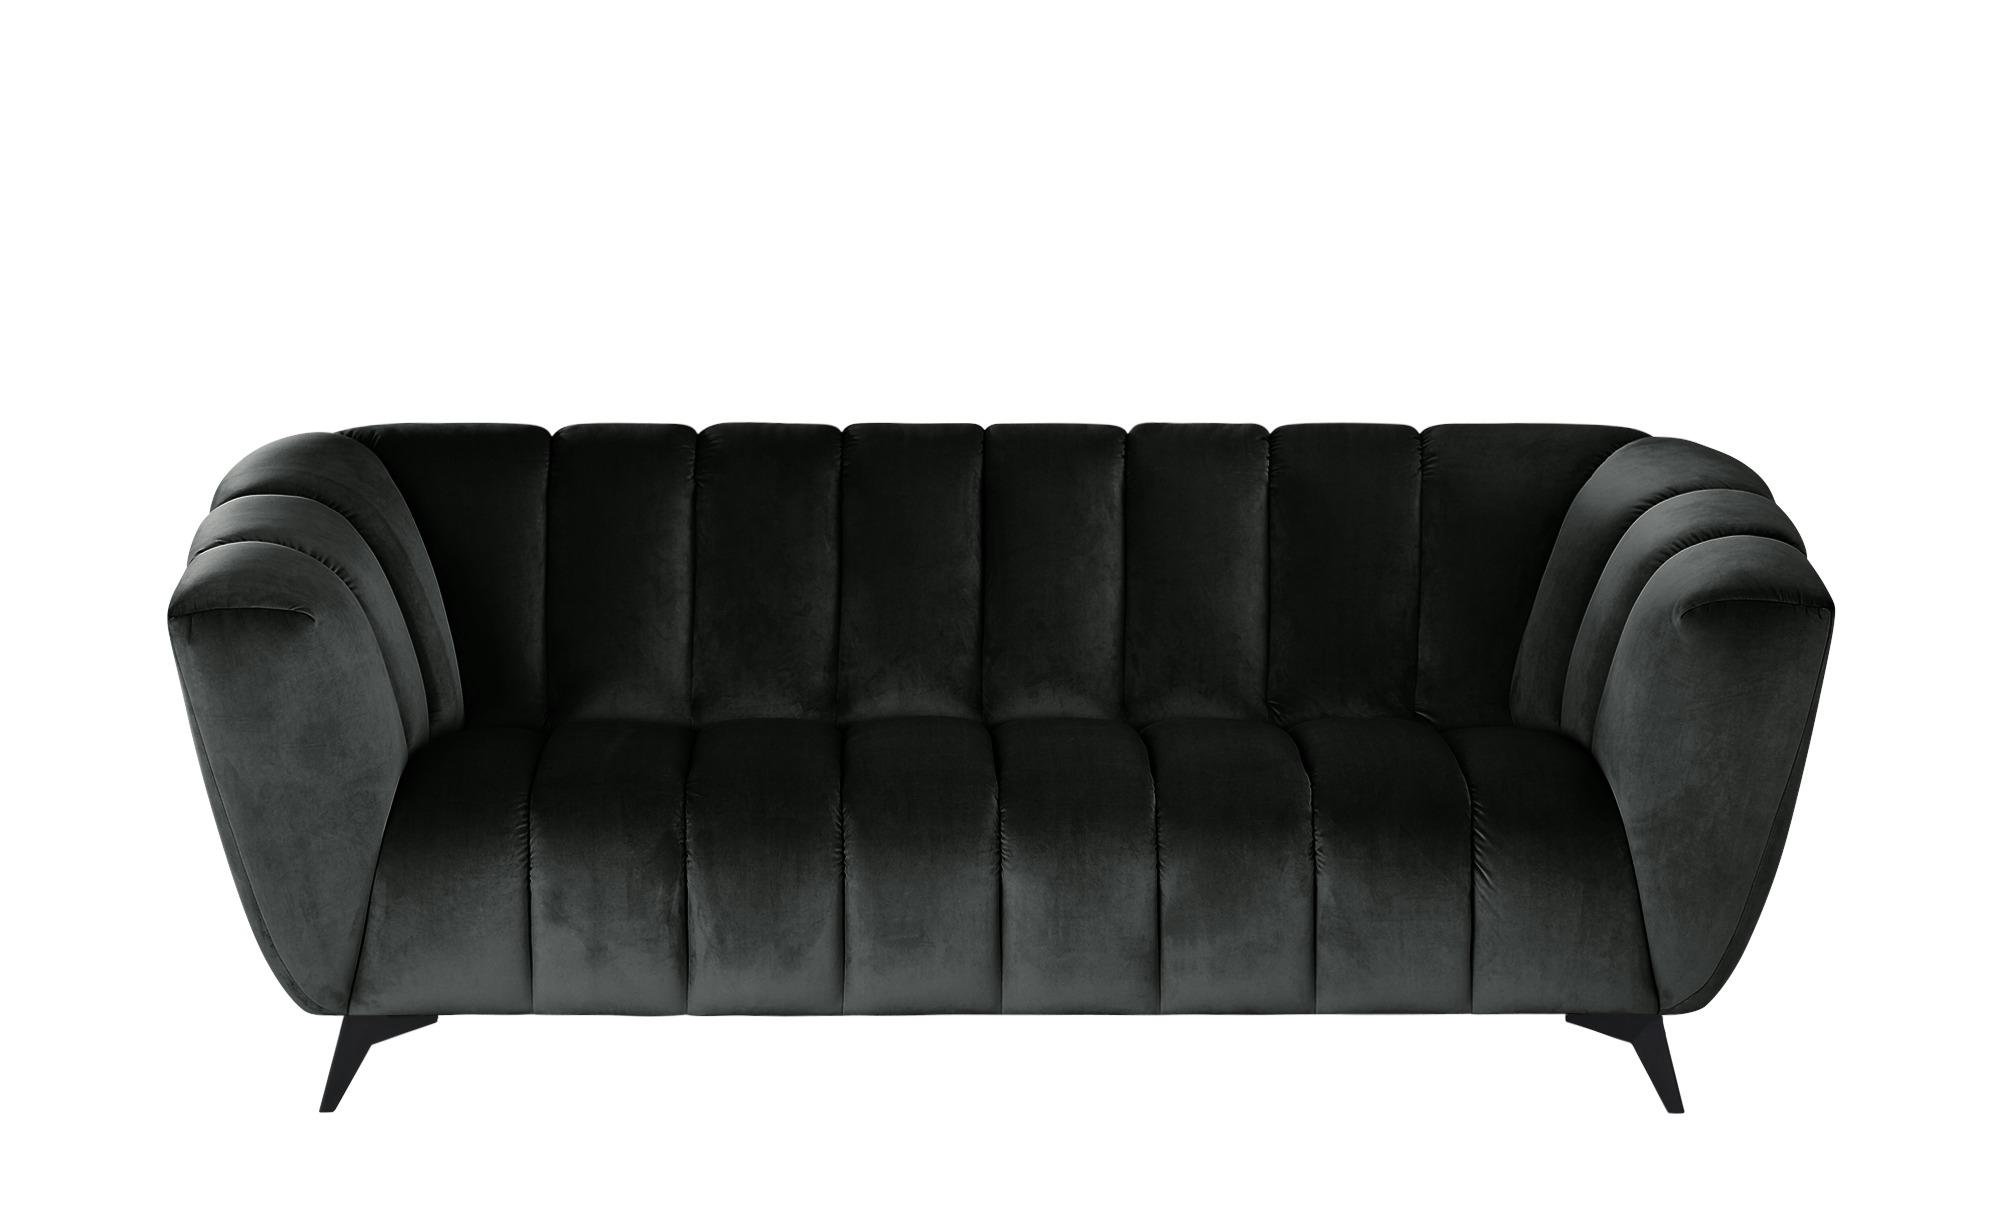 Sofa  Samantha ¦ grau ¦ Maße (cm): B: 220 H: 86 T: 100 Polstermöbel > Sofas > 3-Sitzer - Höffner